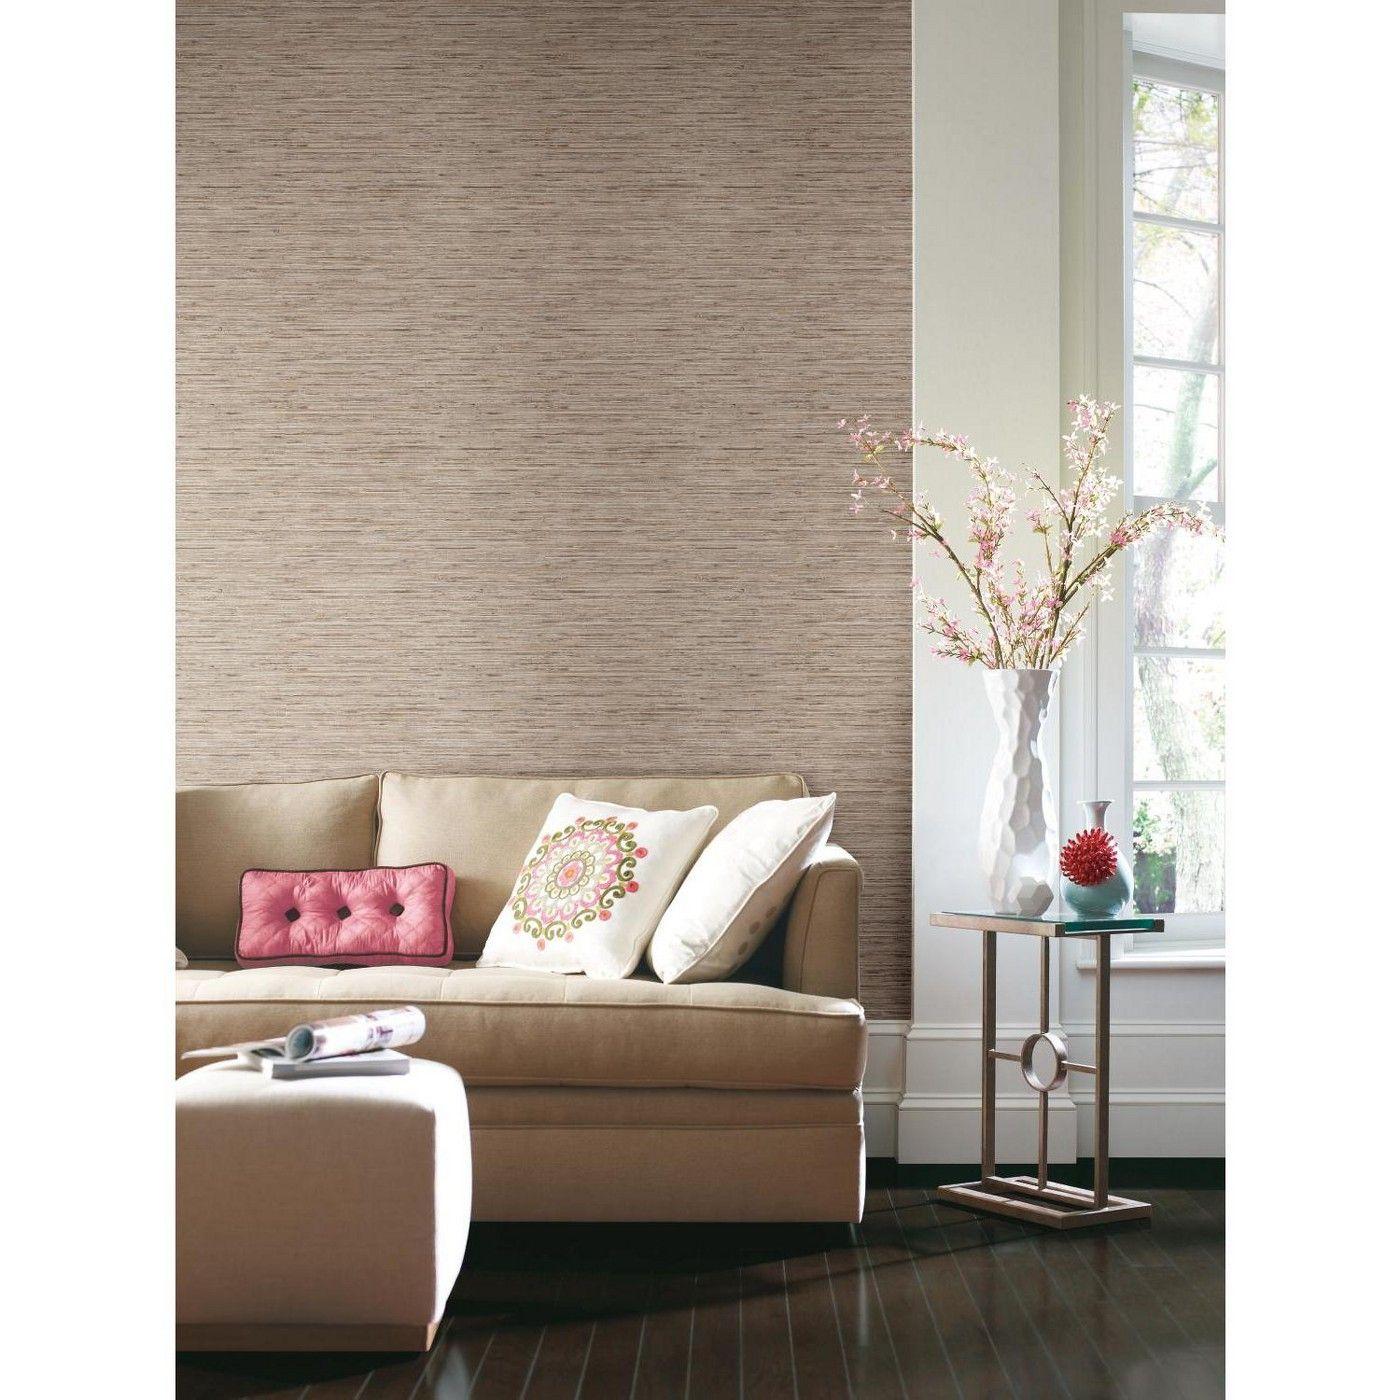 Grasscloth Peel & Stick Wallpaper RoomMates Peel